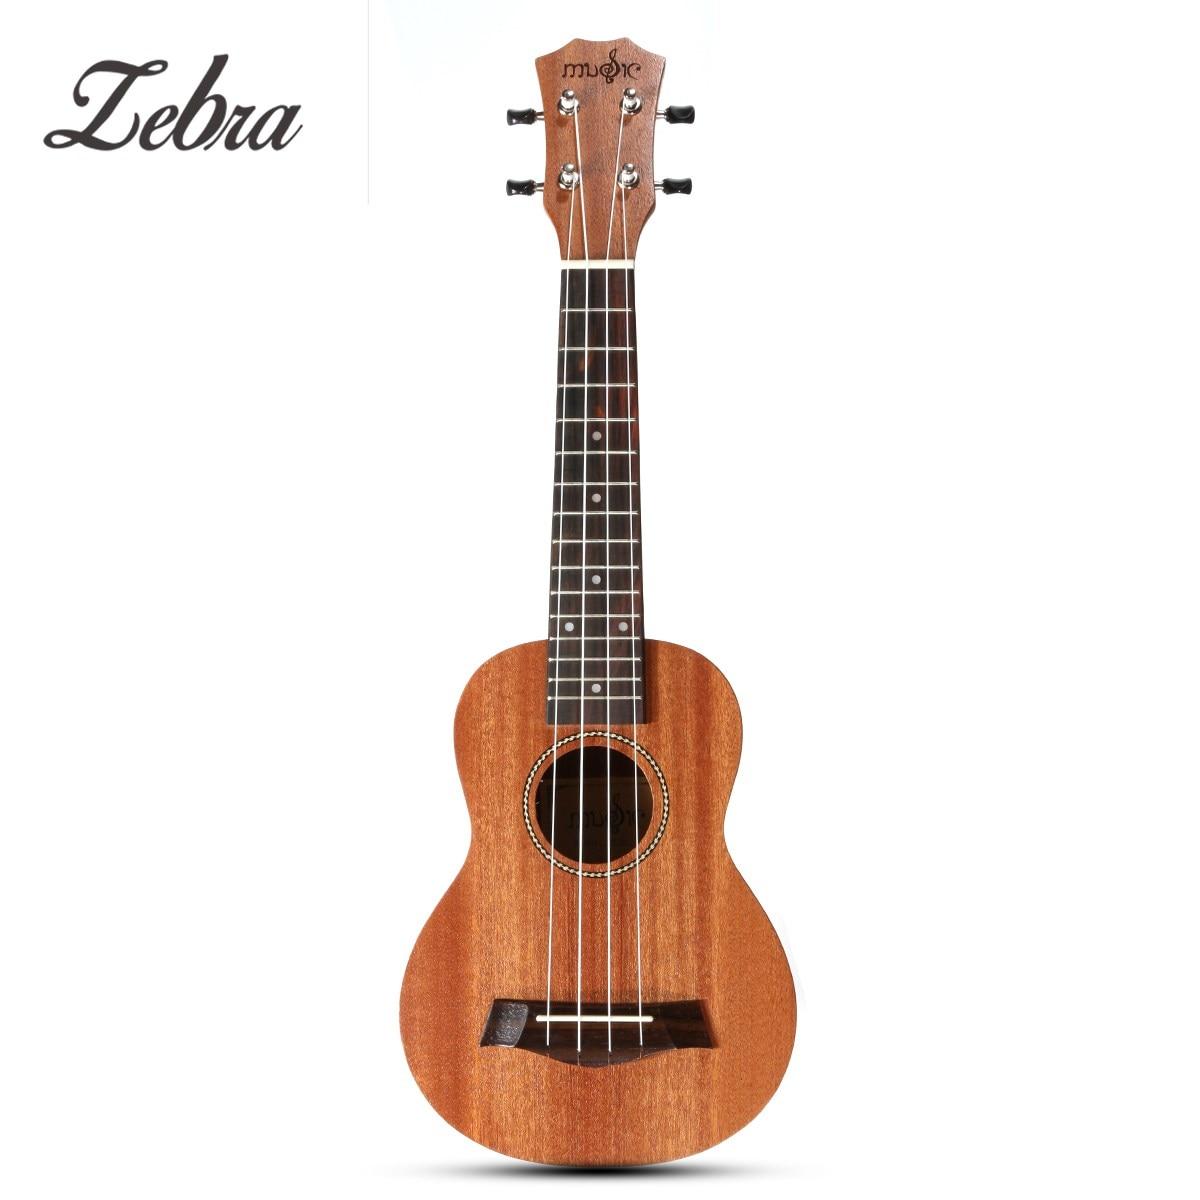 21 Inch 15 Frets Classic Mahogany Ukulele Uke 4 Strings Rosewood Fingerboard Guitar Stringed Instruments Best Gift For Beginners